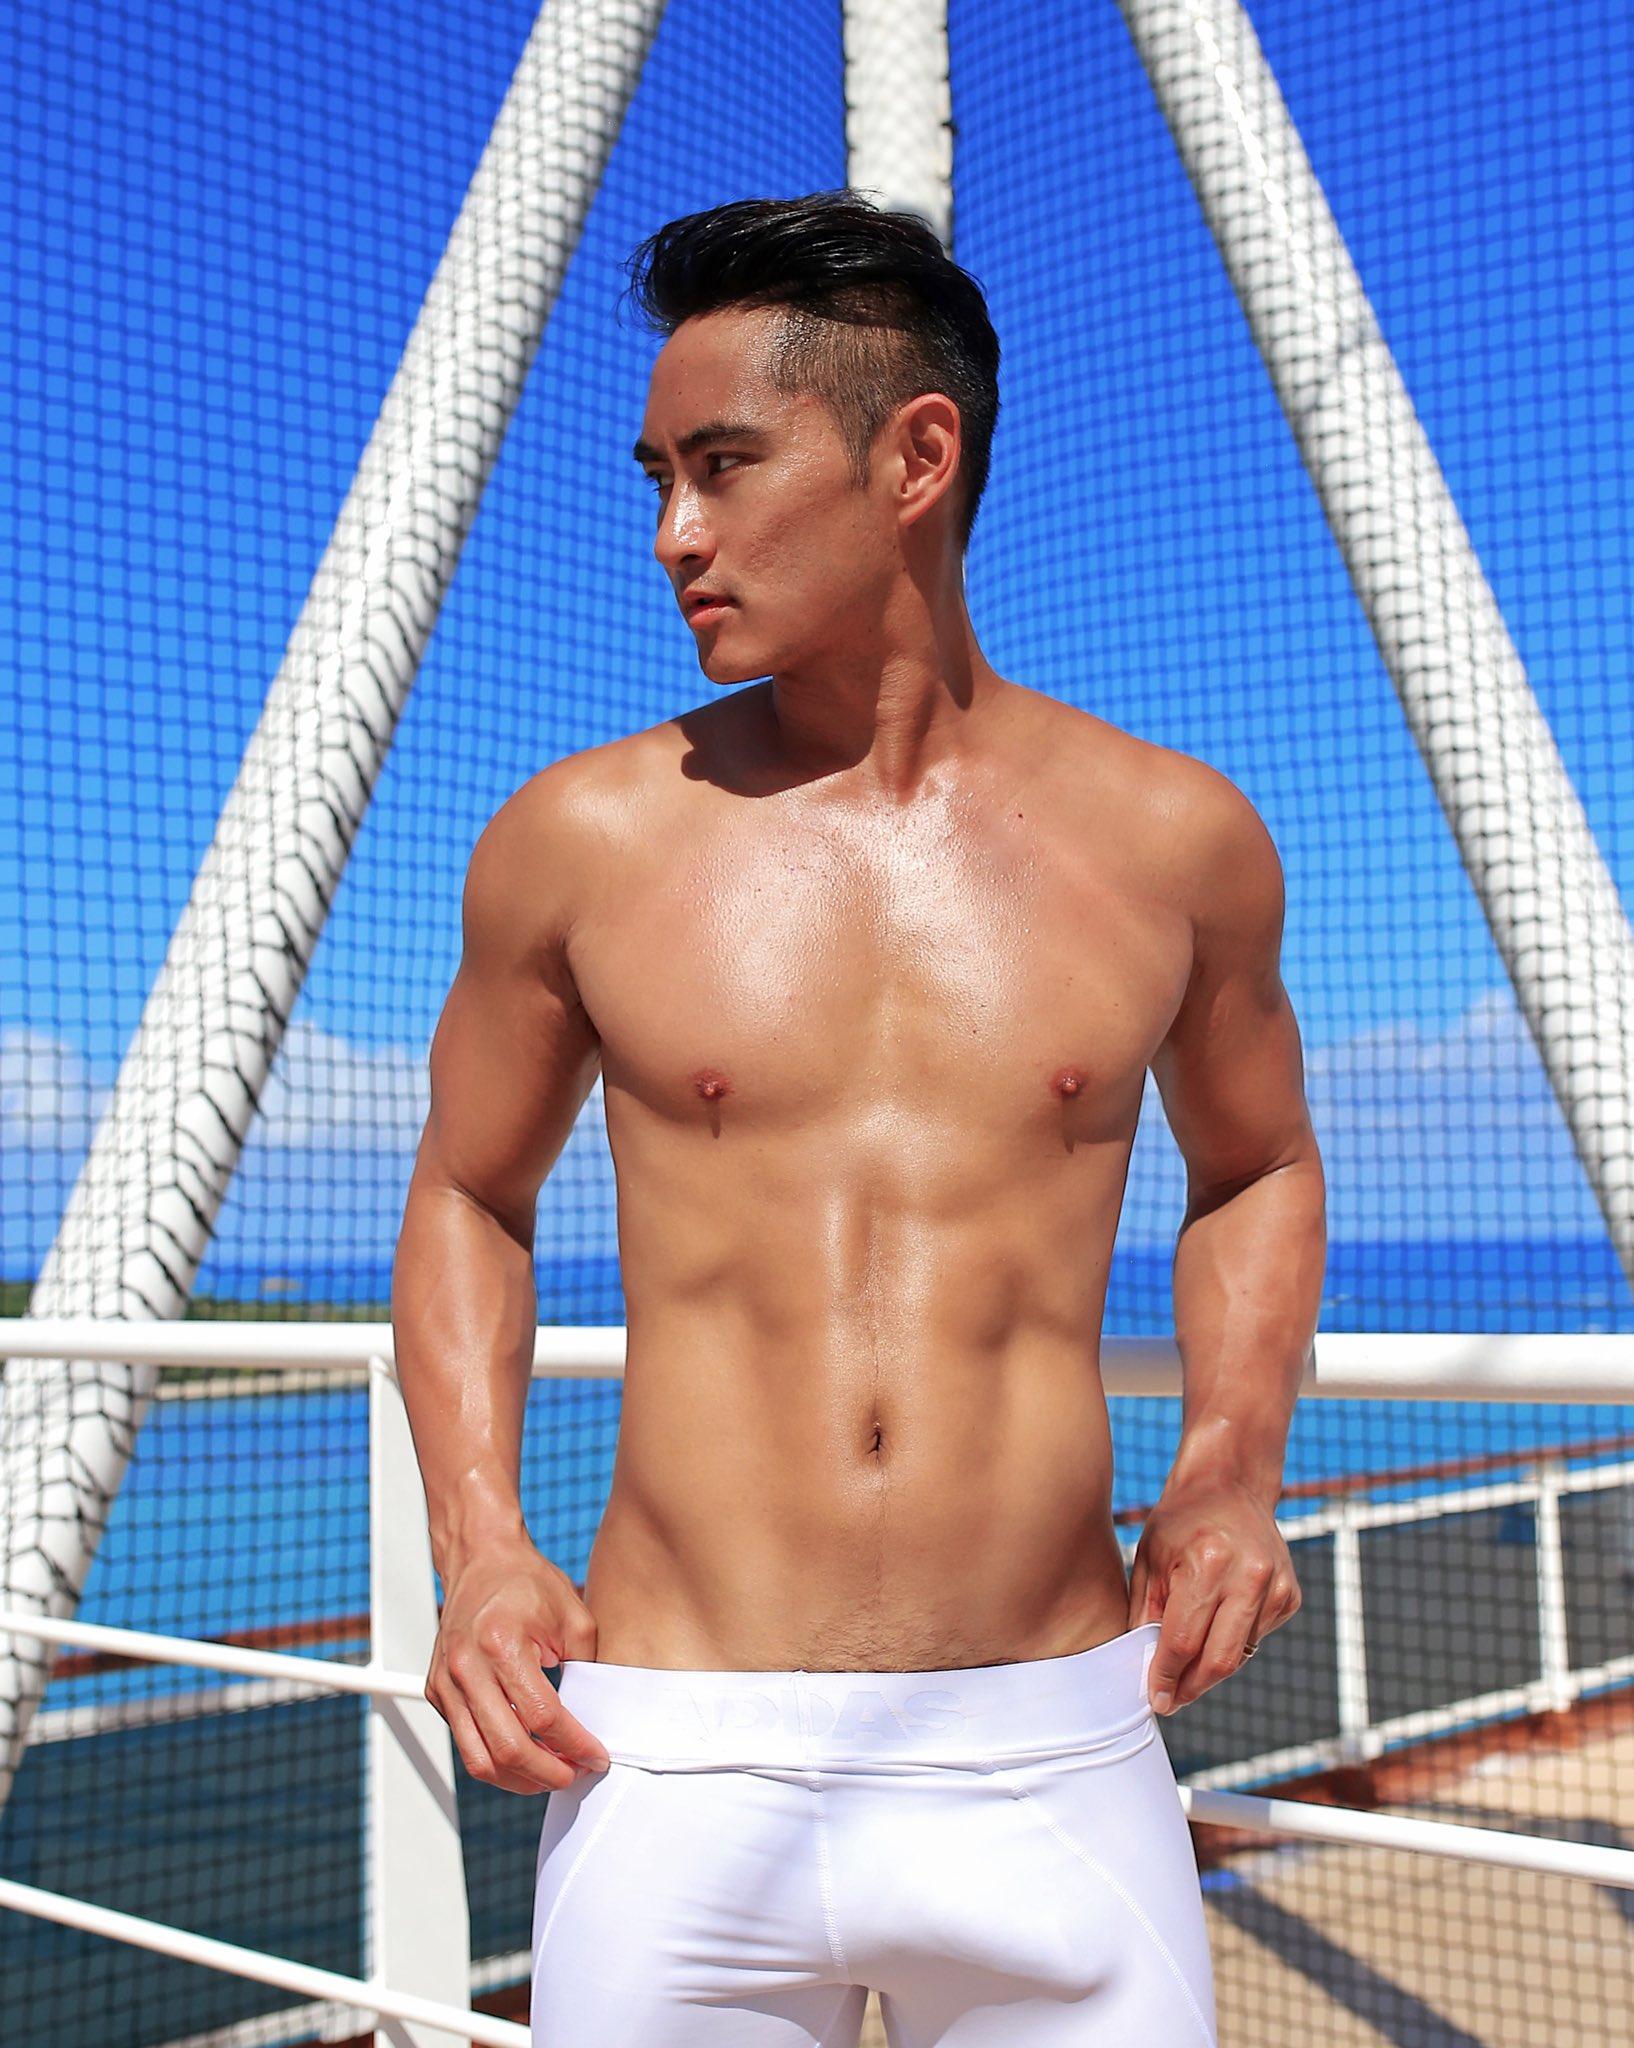 2011 - 2012 | Manhunt - Mister International - Mister Universe Model | Hawaii - USA | Rhonee Rojas - Page 35 EOtRLz1U0AA9rNP?format=jpg&name=4096x4096